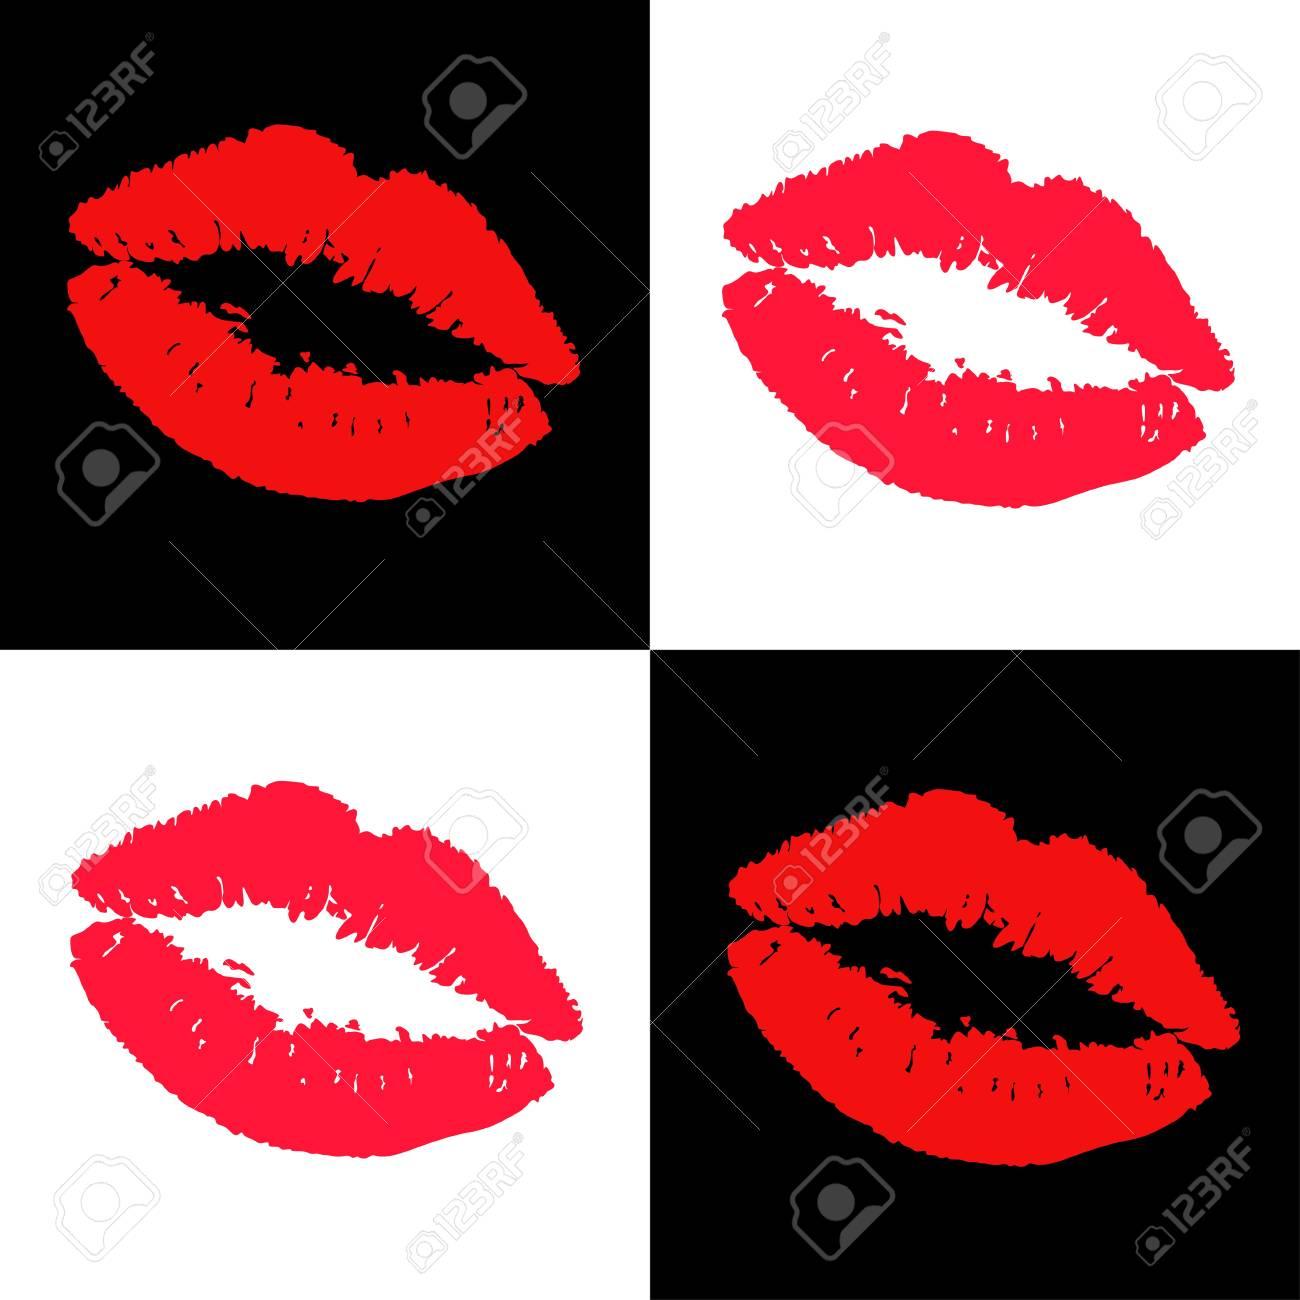 lipstick kisses design elements Stock Vector - 18995153